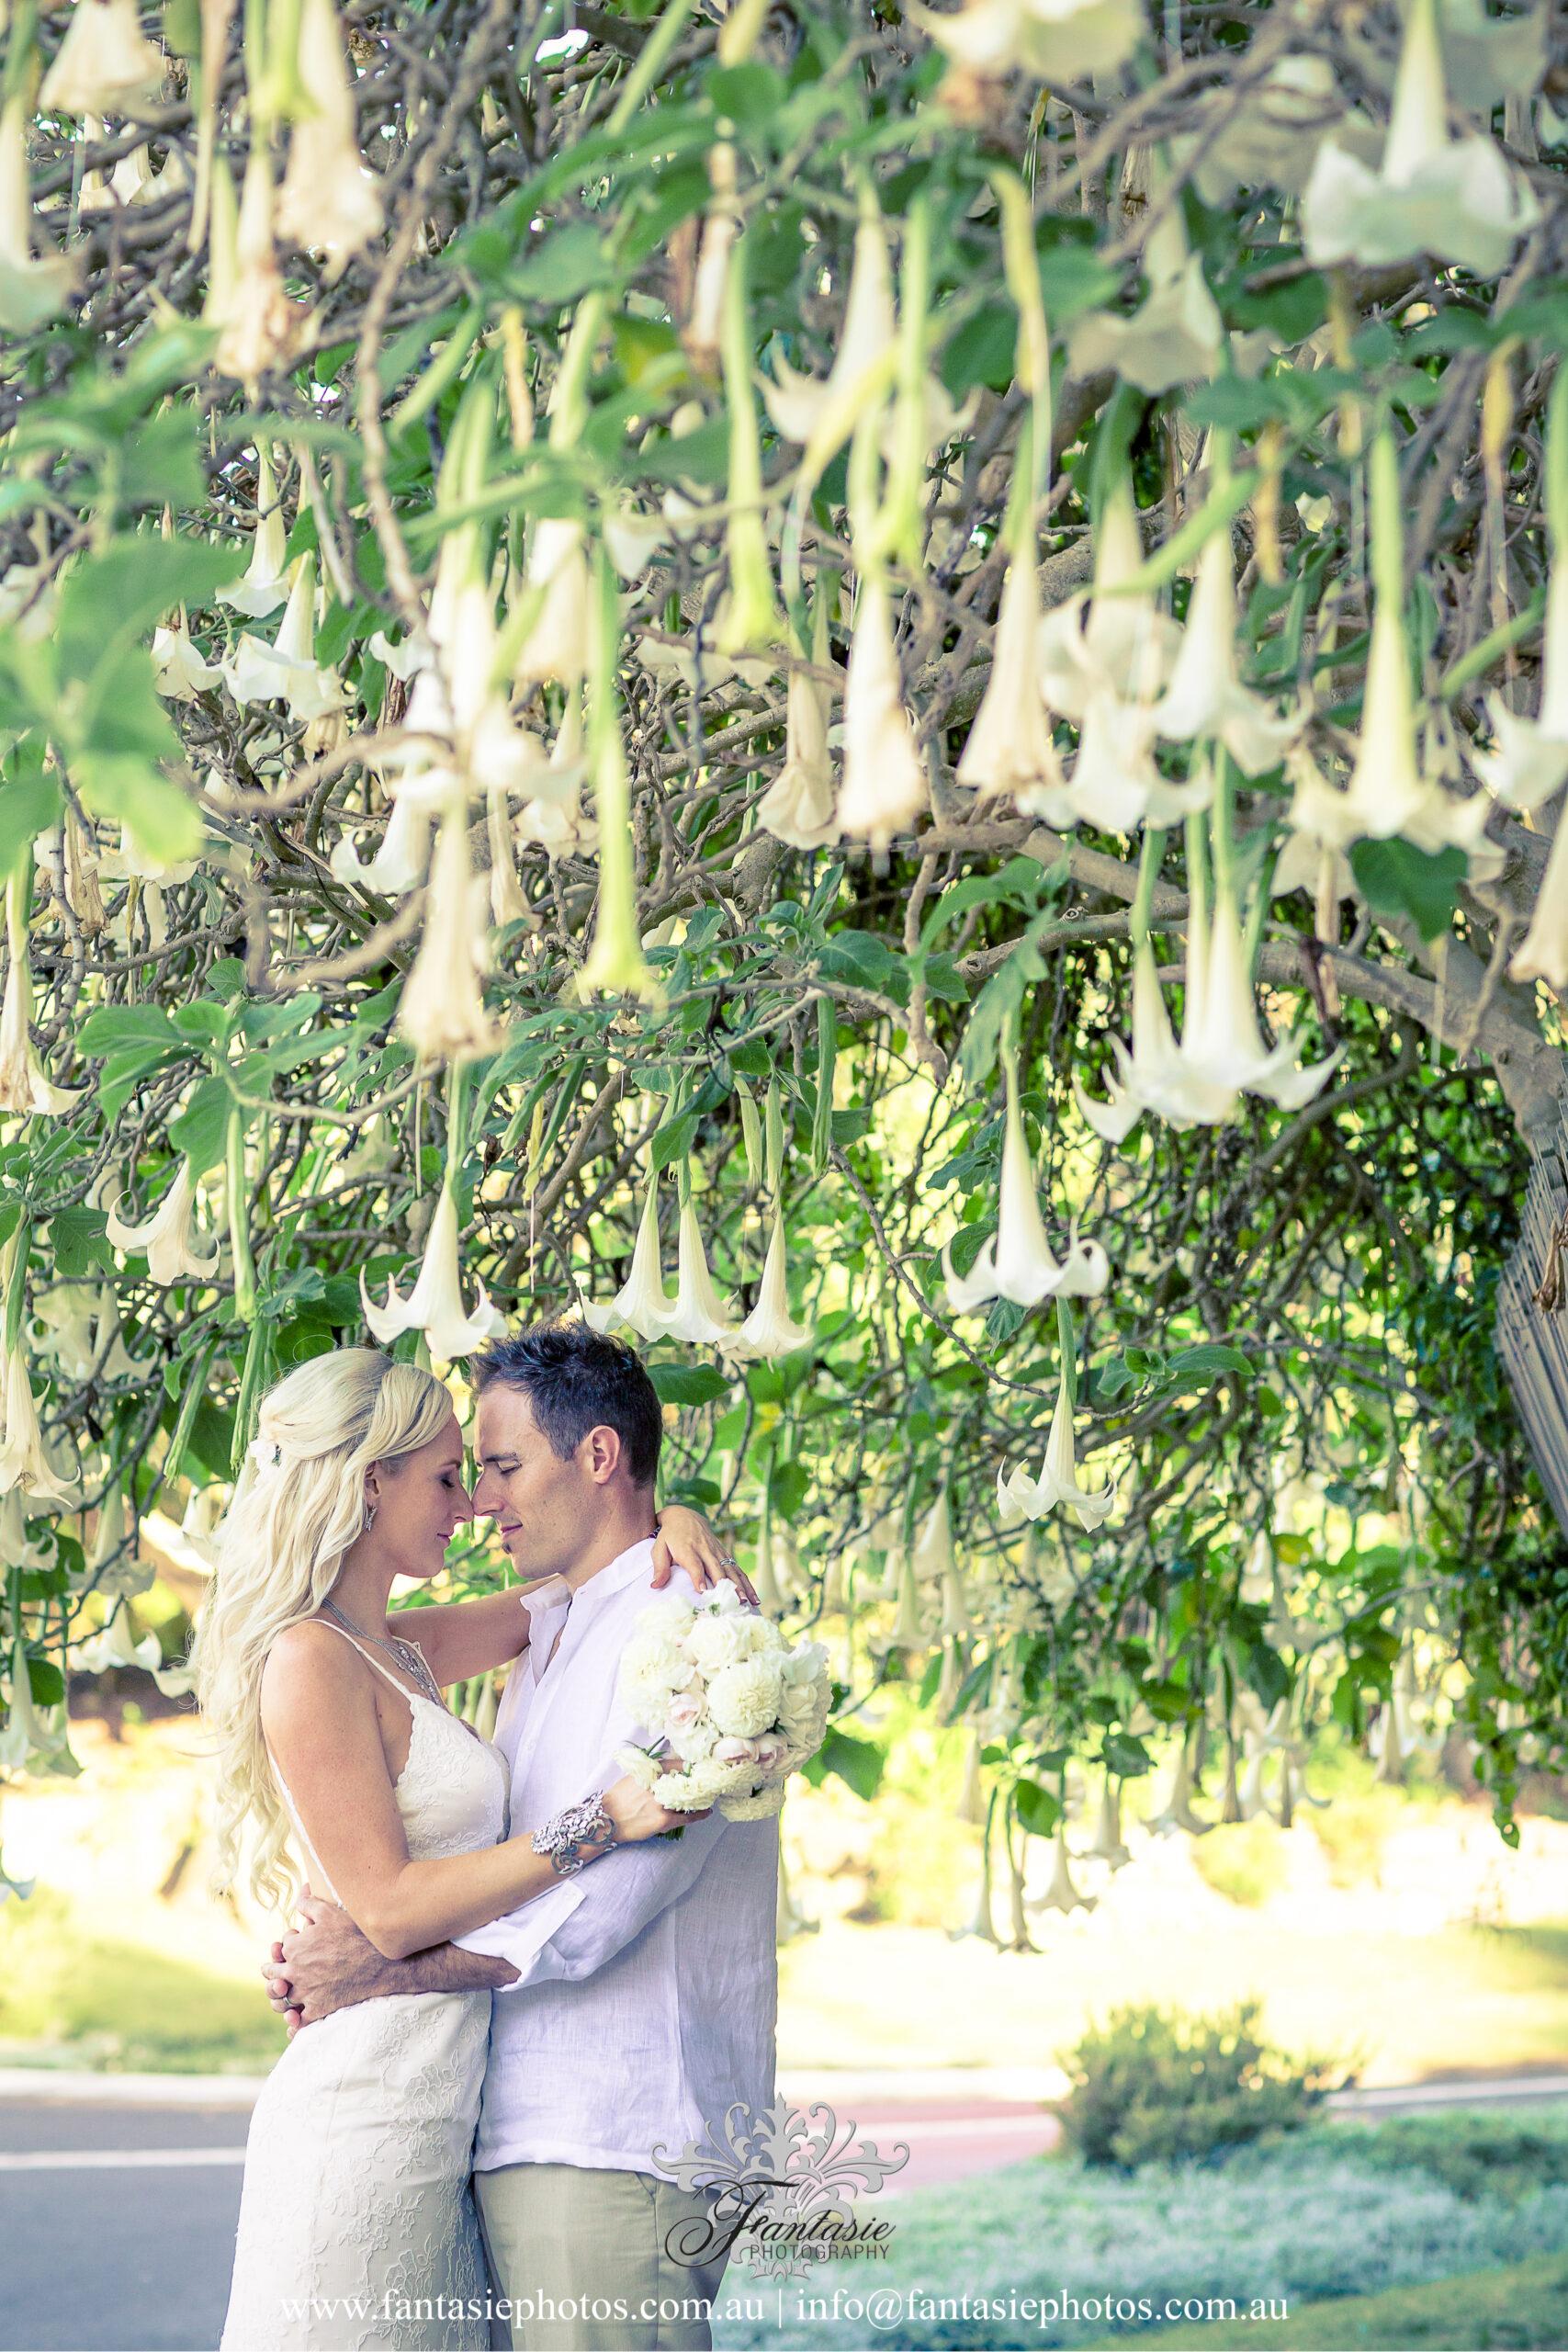 Wedding Photography Shelly Beach | Fantasie Photography